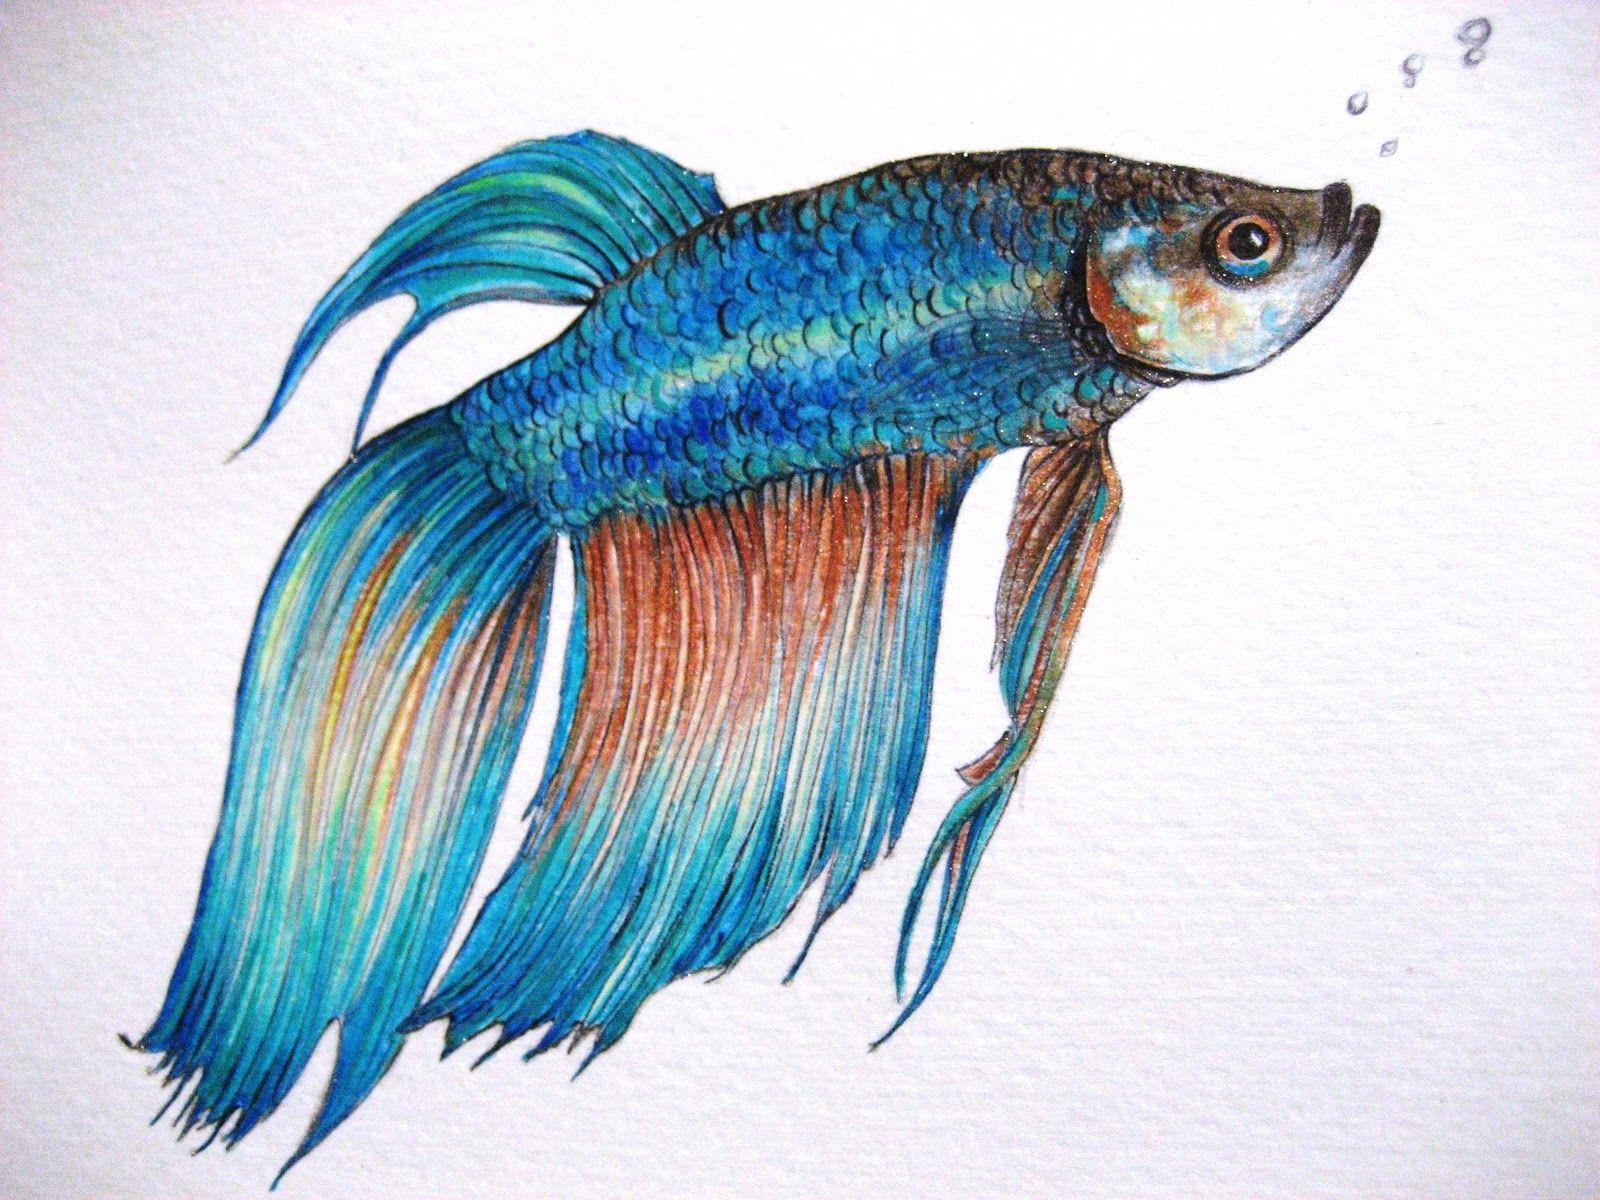 betta fish drawing - Google Search | Fish drawings, Betta ...